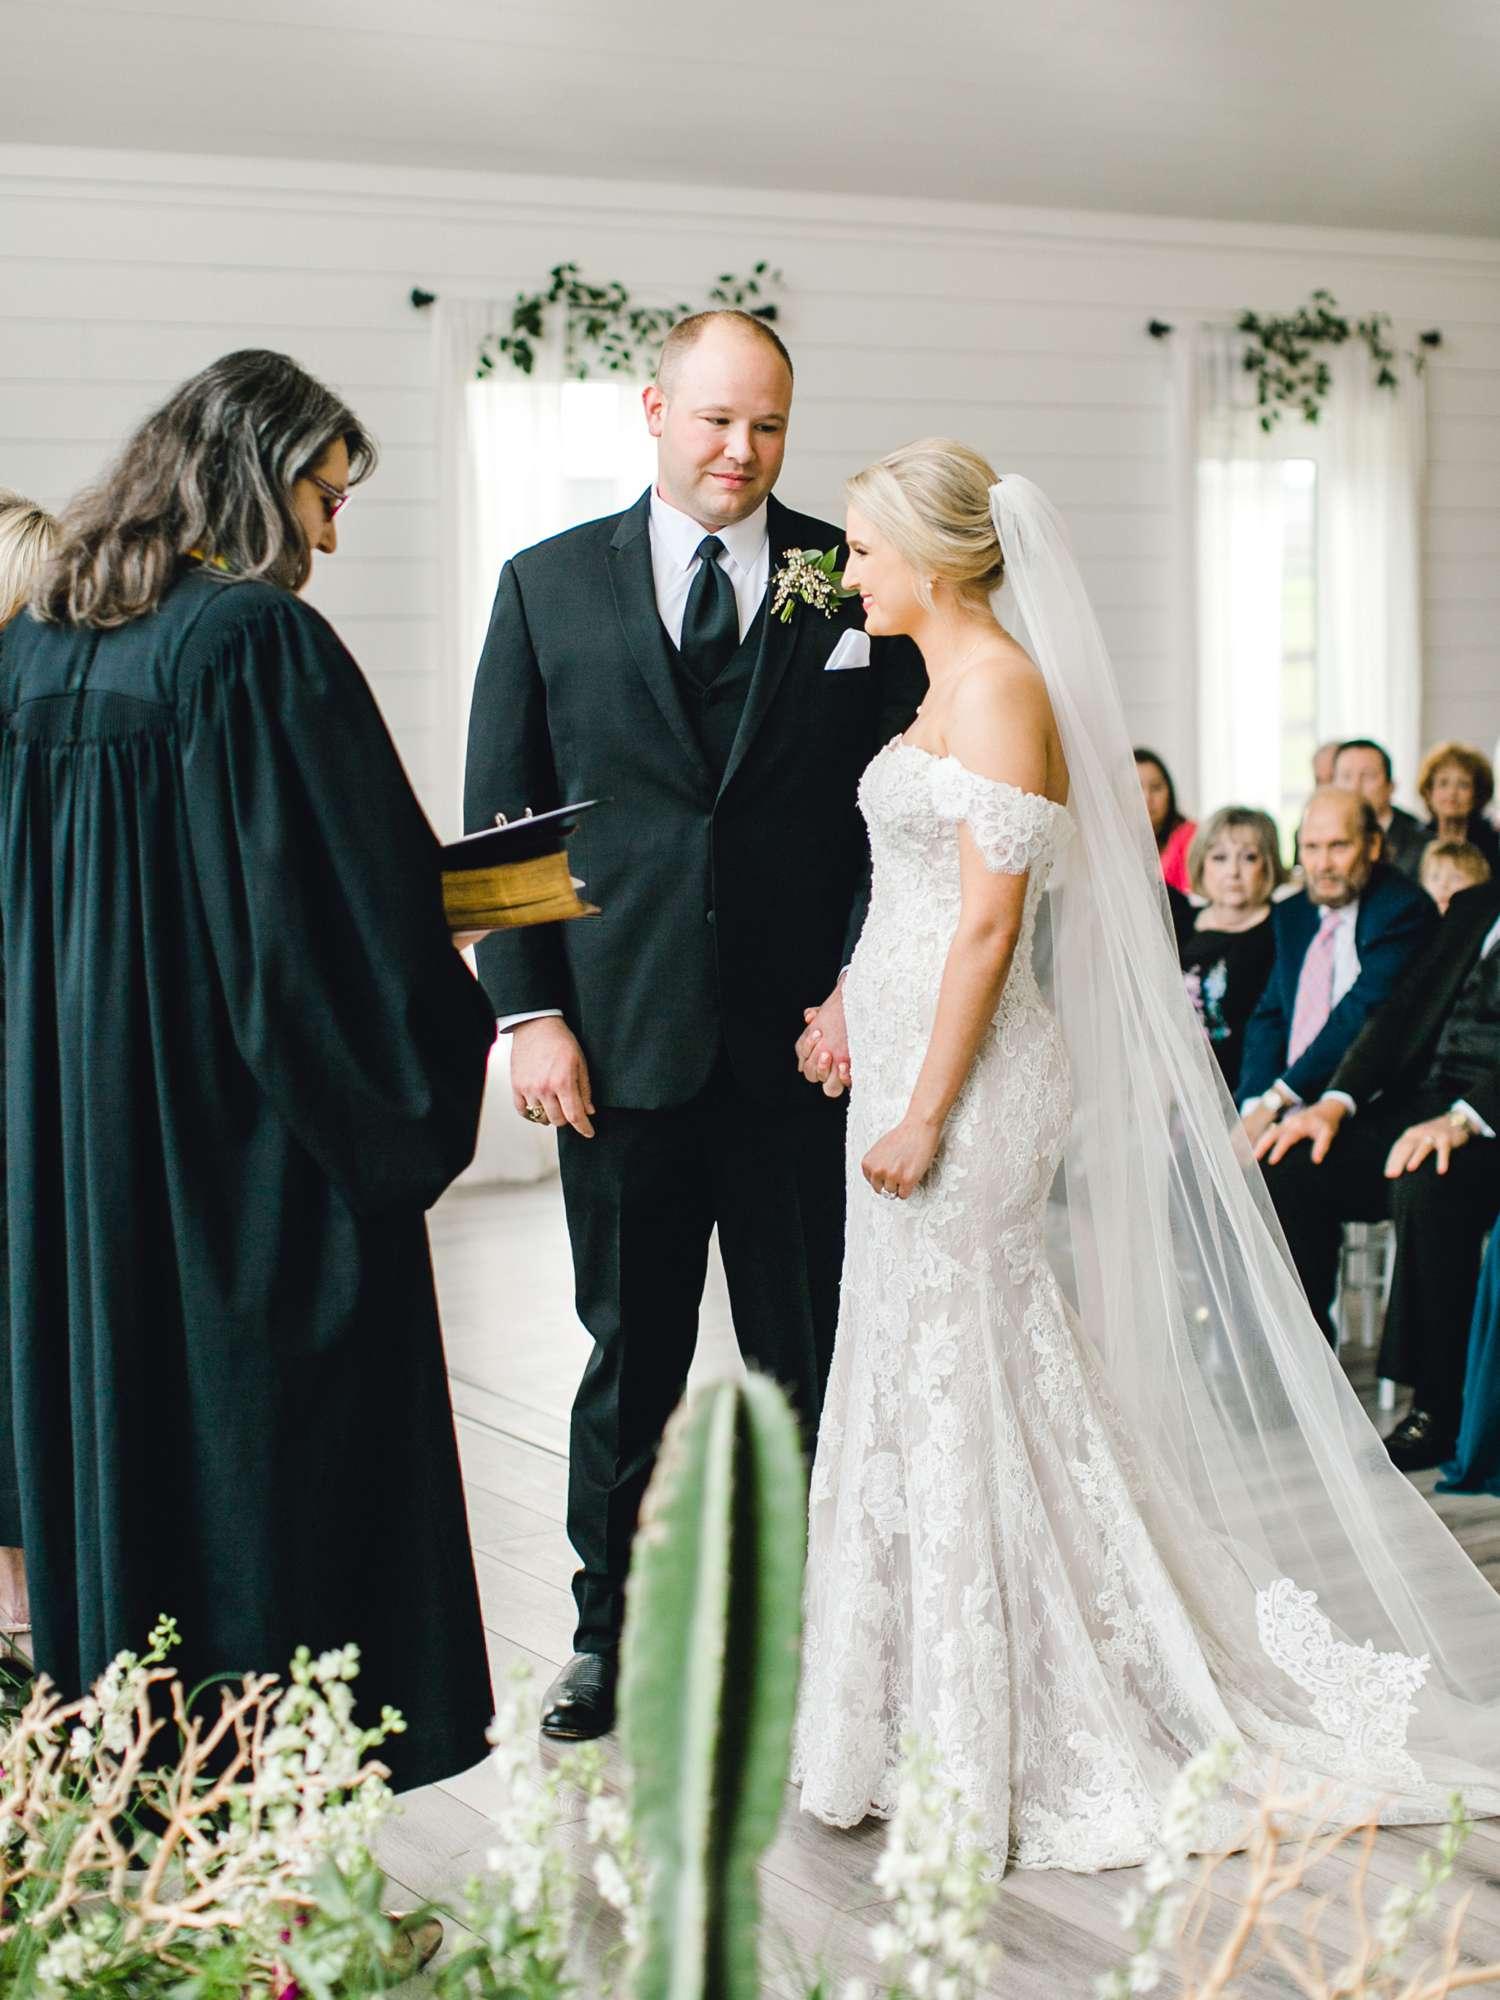 HEBERT_MORGAN_AND_CLAY_ALLEEJ_THE_FARMHOUSE_MONTGOMERY_TEXAS_WEDDING_0087.jpg